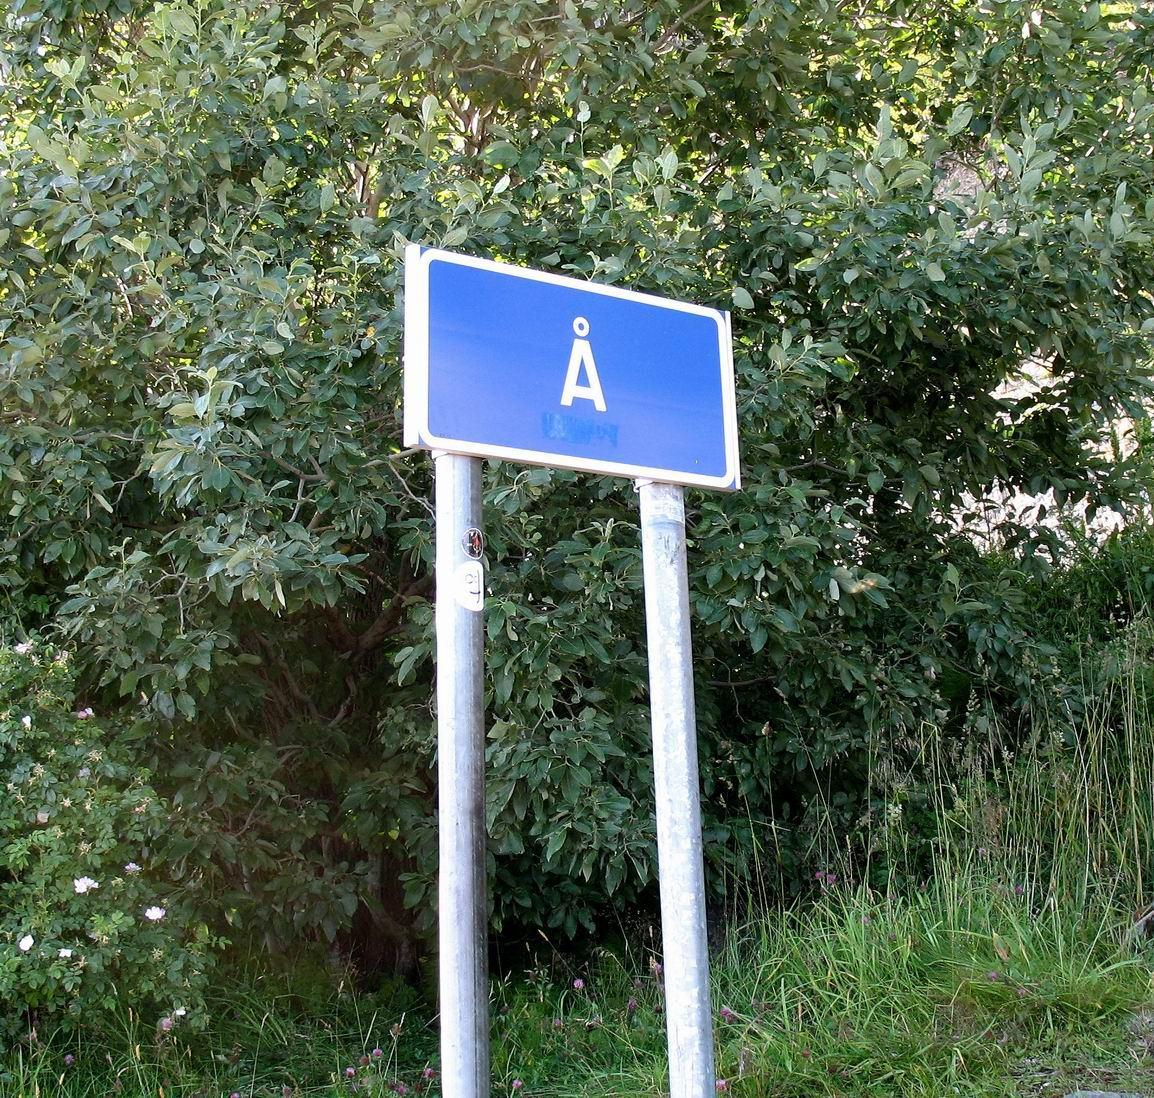 0_a40a7_f94a14c8_orig.jpg